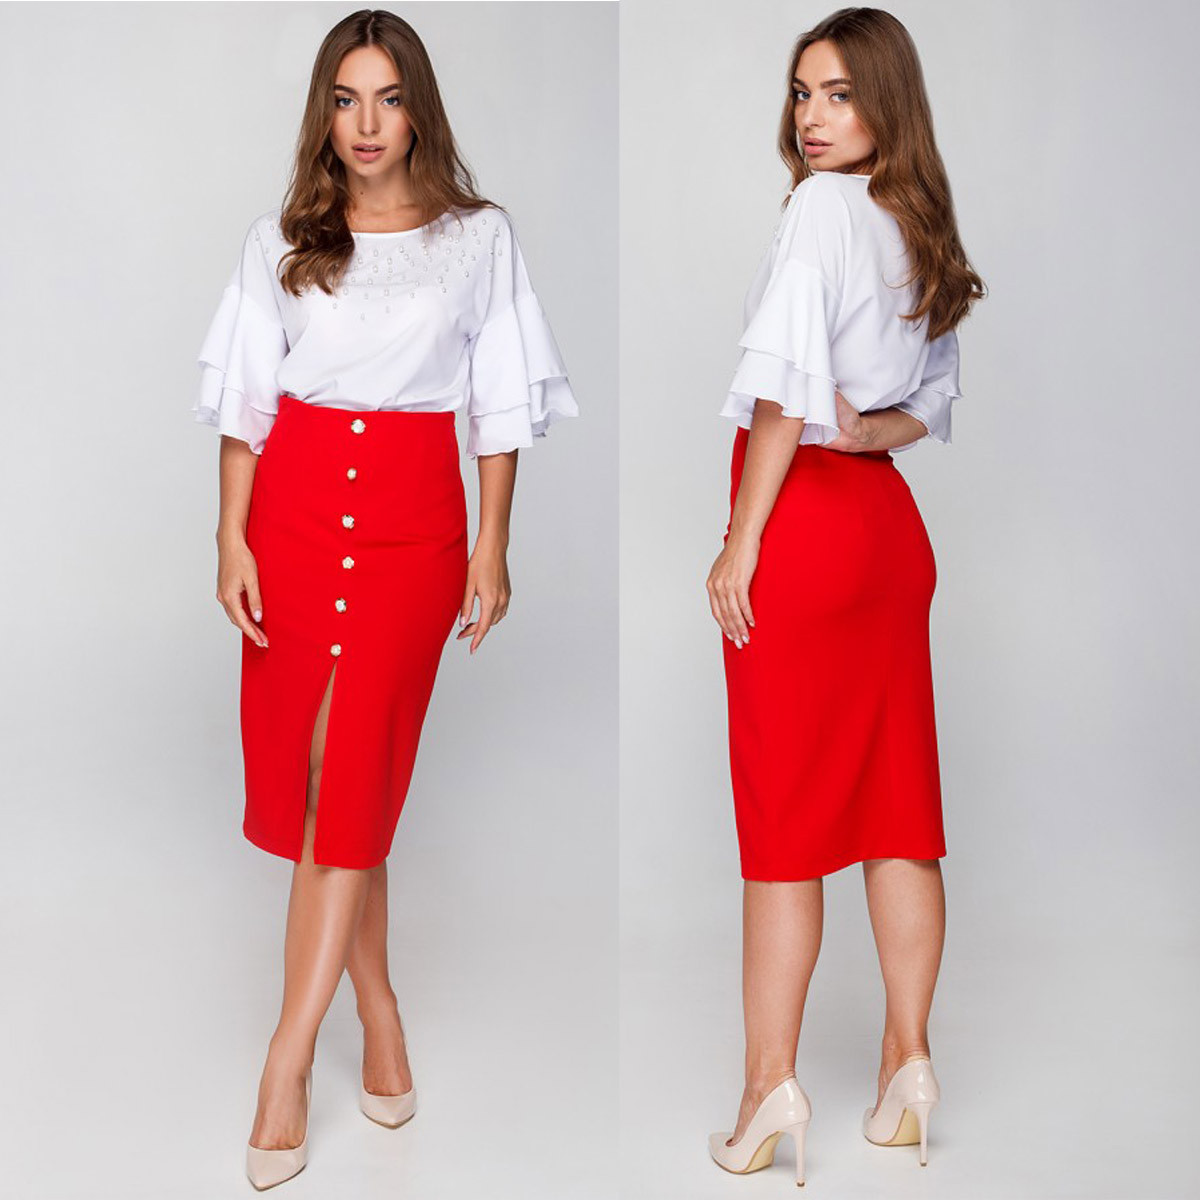 8ca1dd6fc943 Деловая красная юбка карандаш размер M